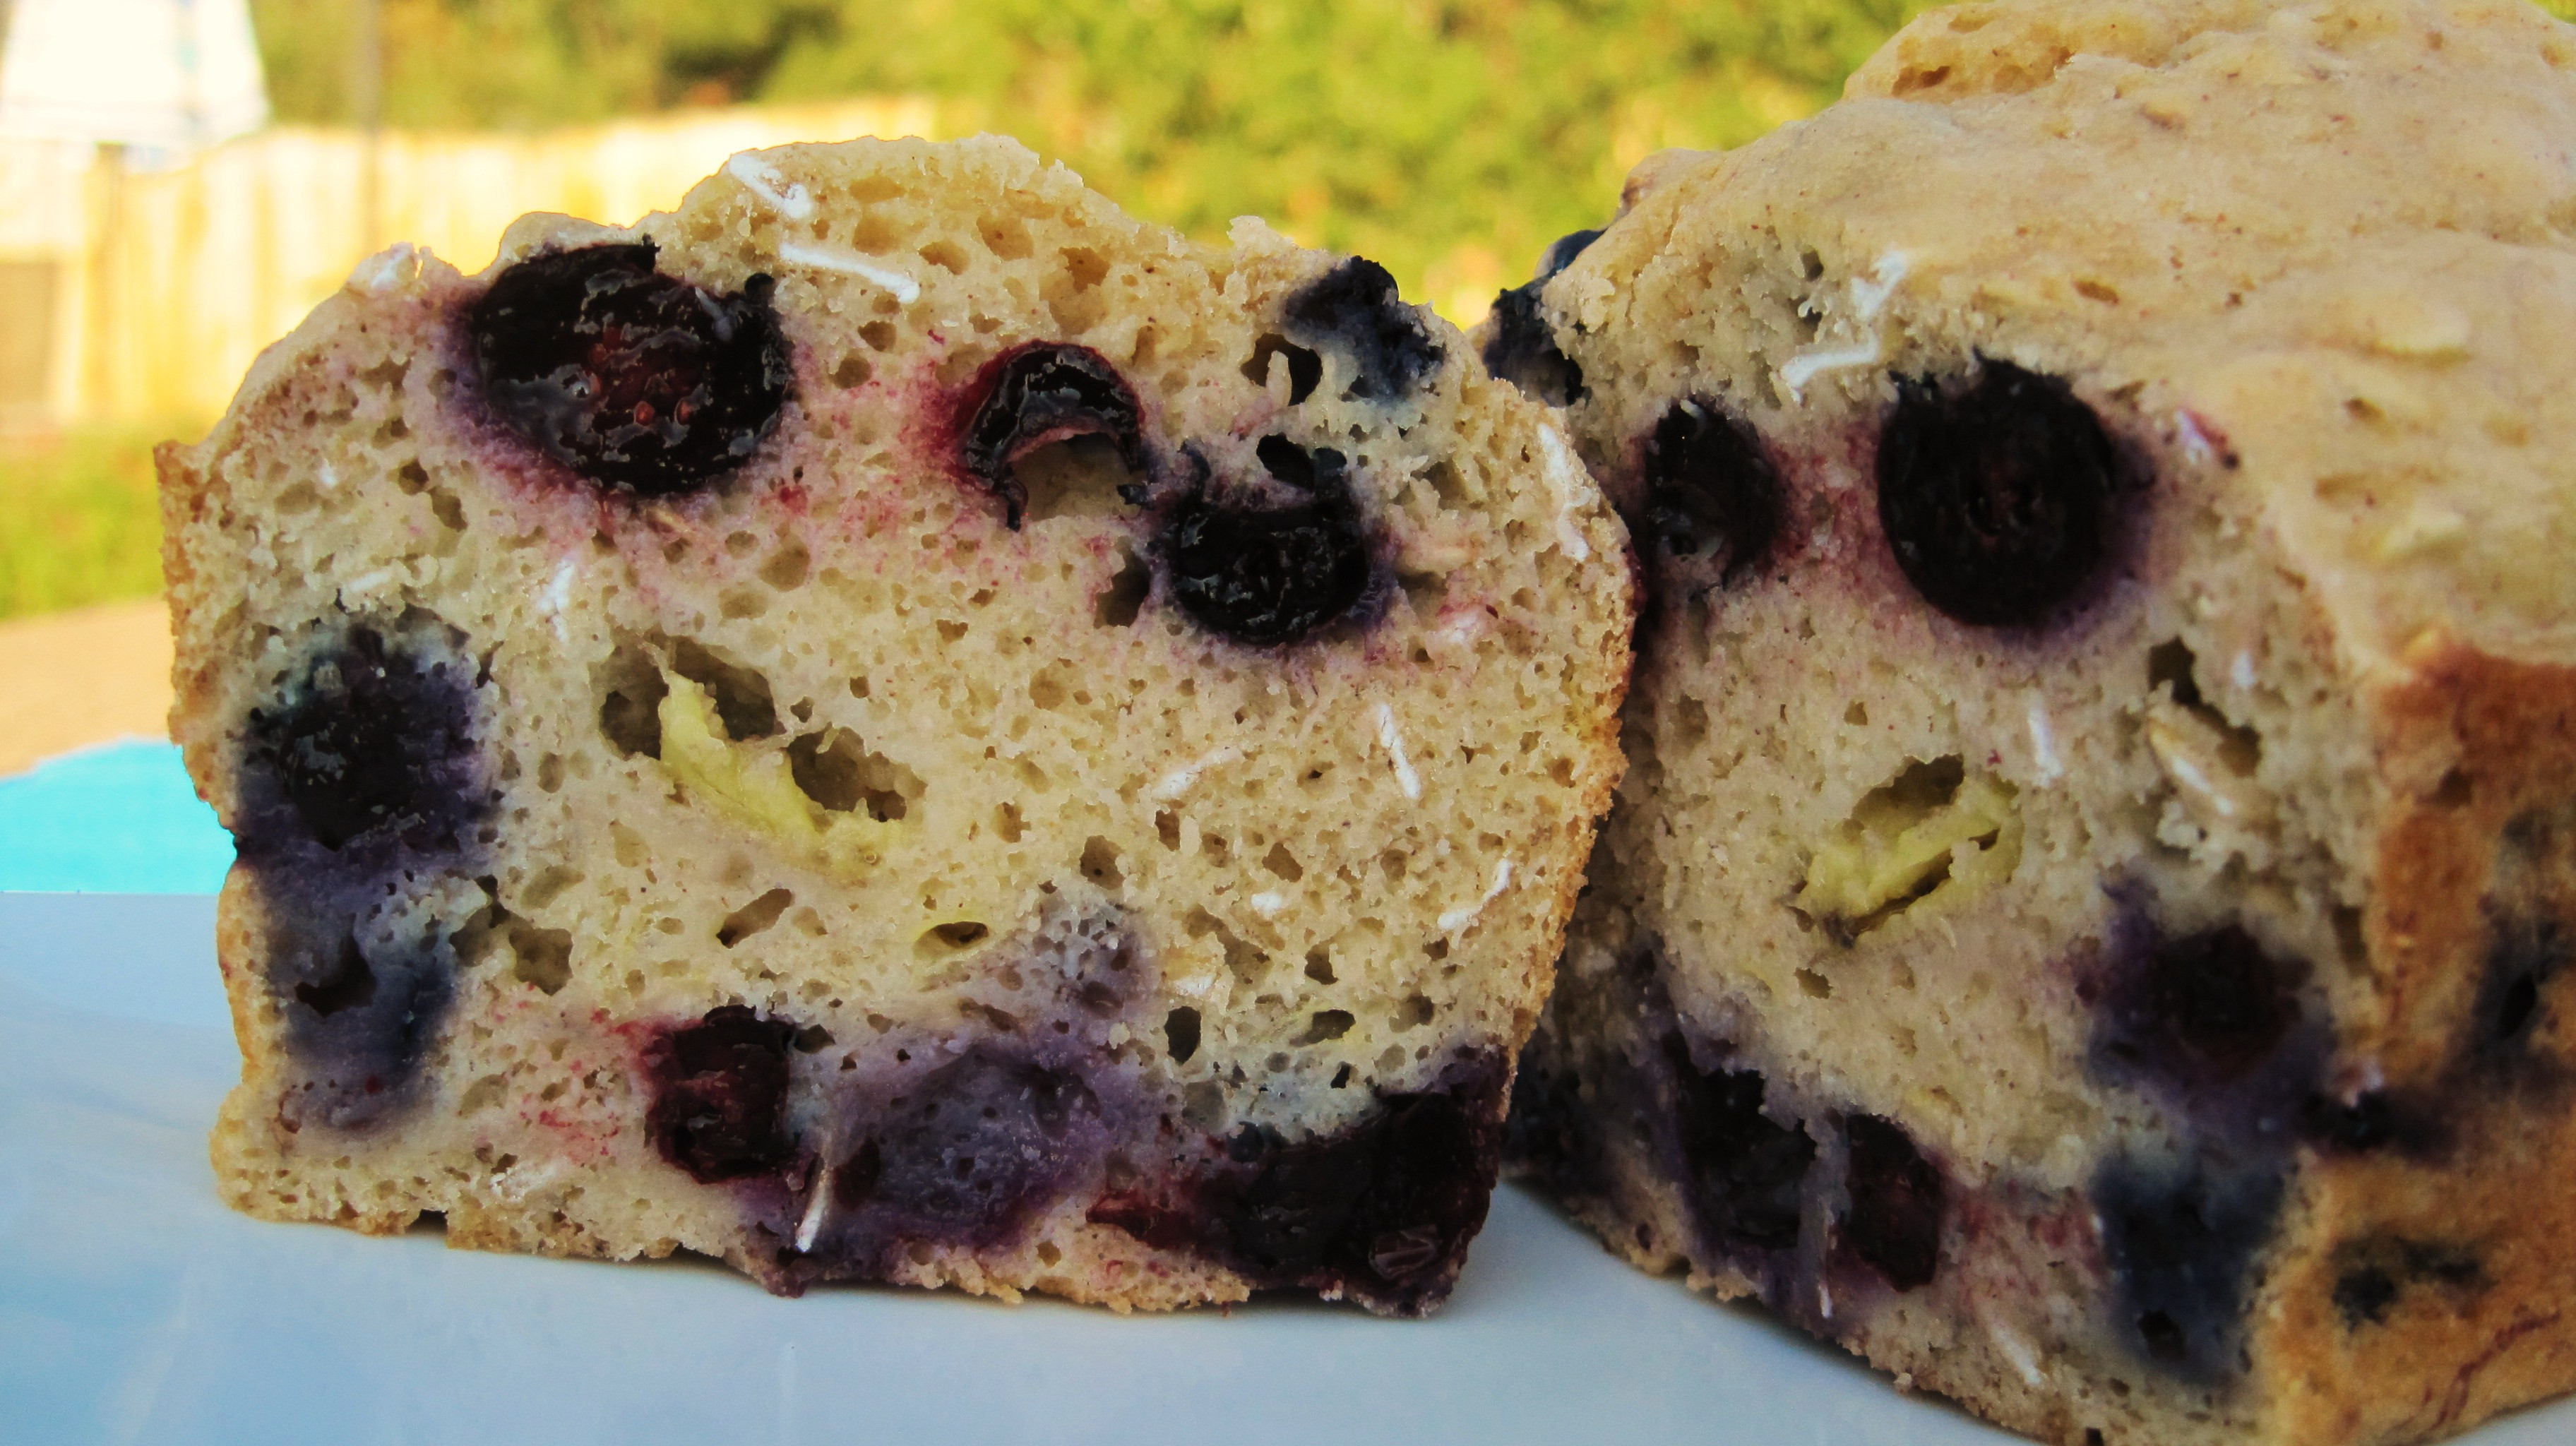 Banana Blueberry Bread Healthy the 20 Best Ideas for Healthy Banana Blueberry Bread & A Tasty Flop